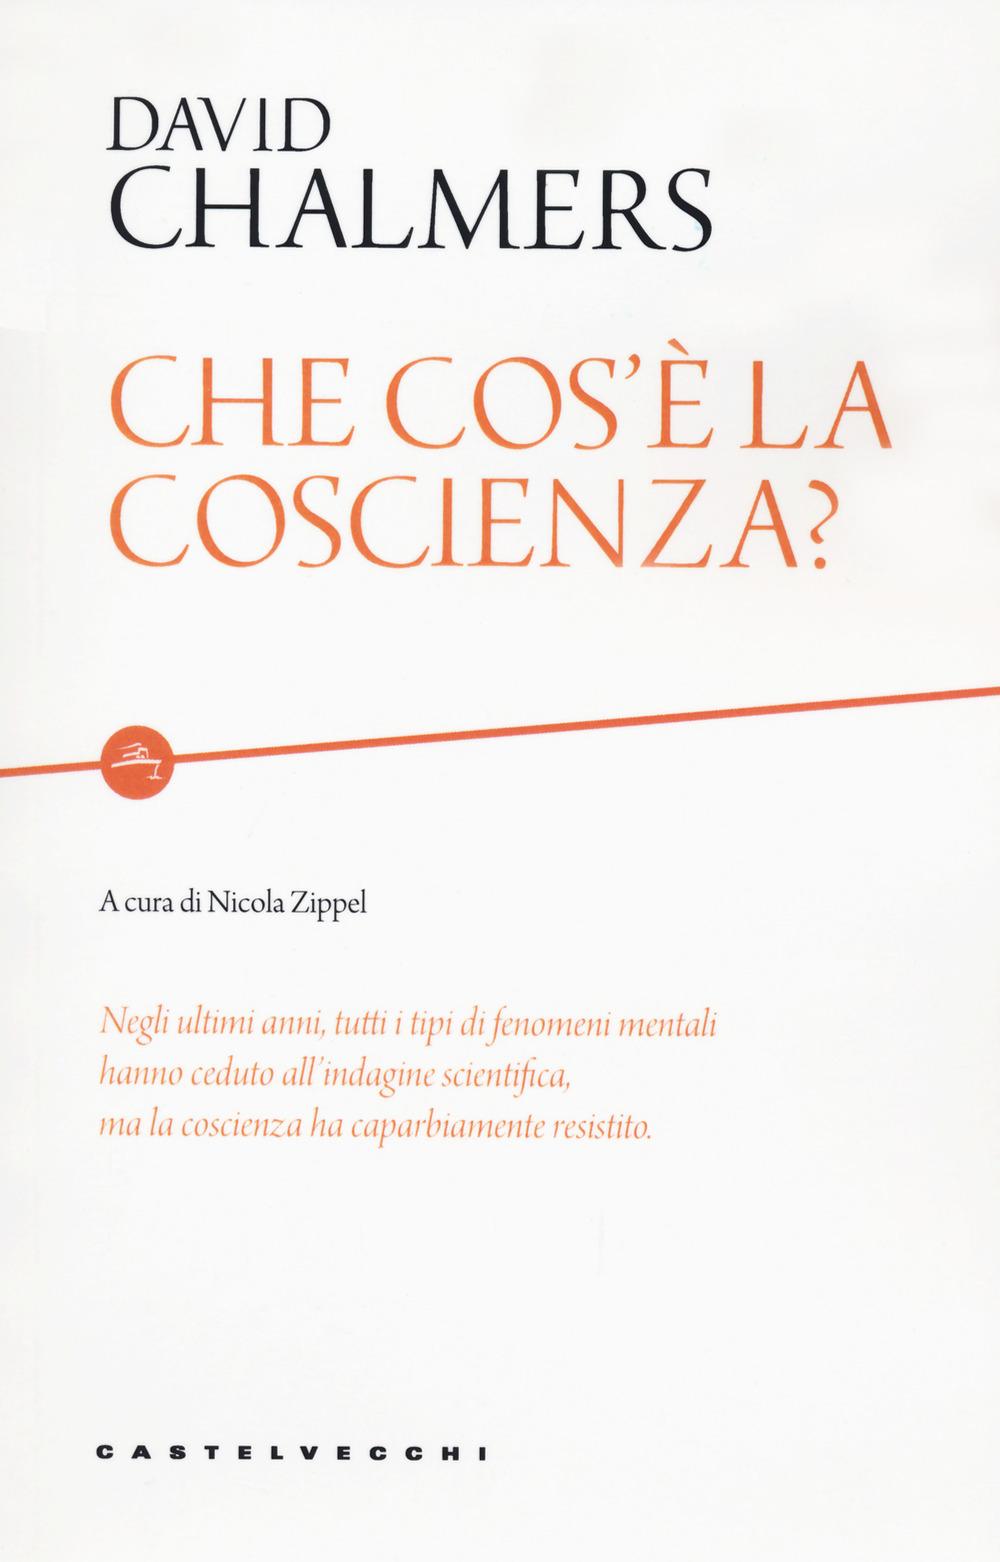 CHE COS'È LA COSCIENZA? - Chalmers David; Zippel N. (cur.) - 9788832900088